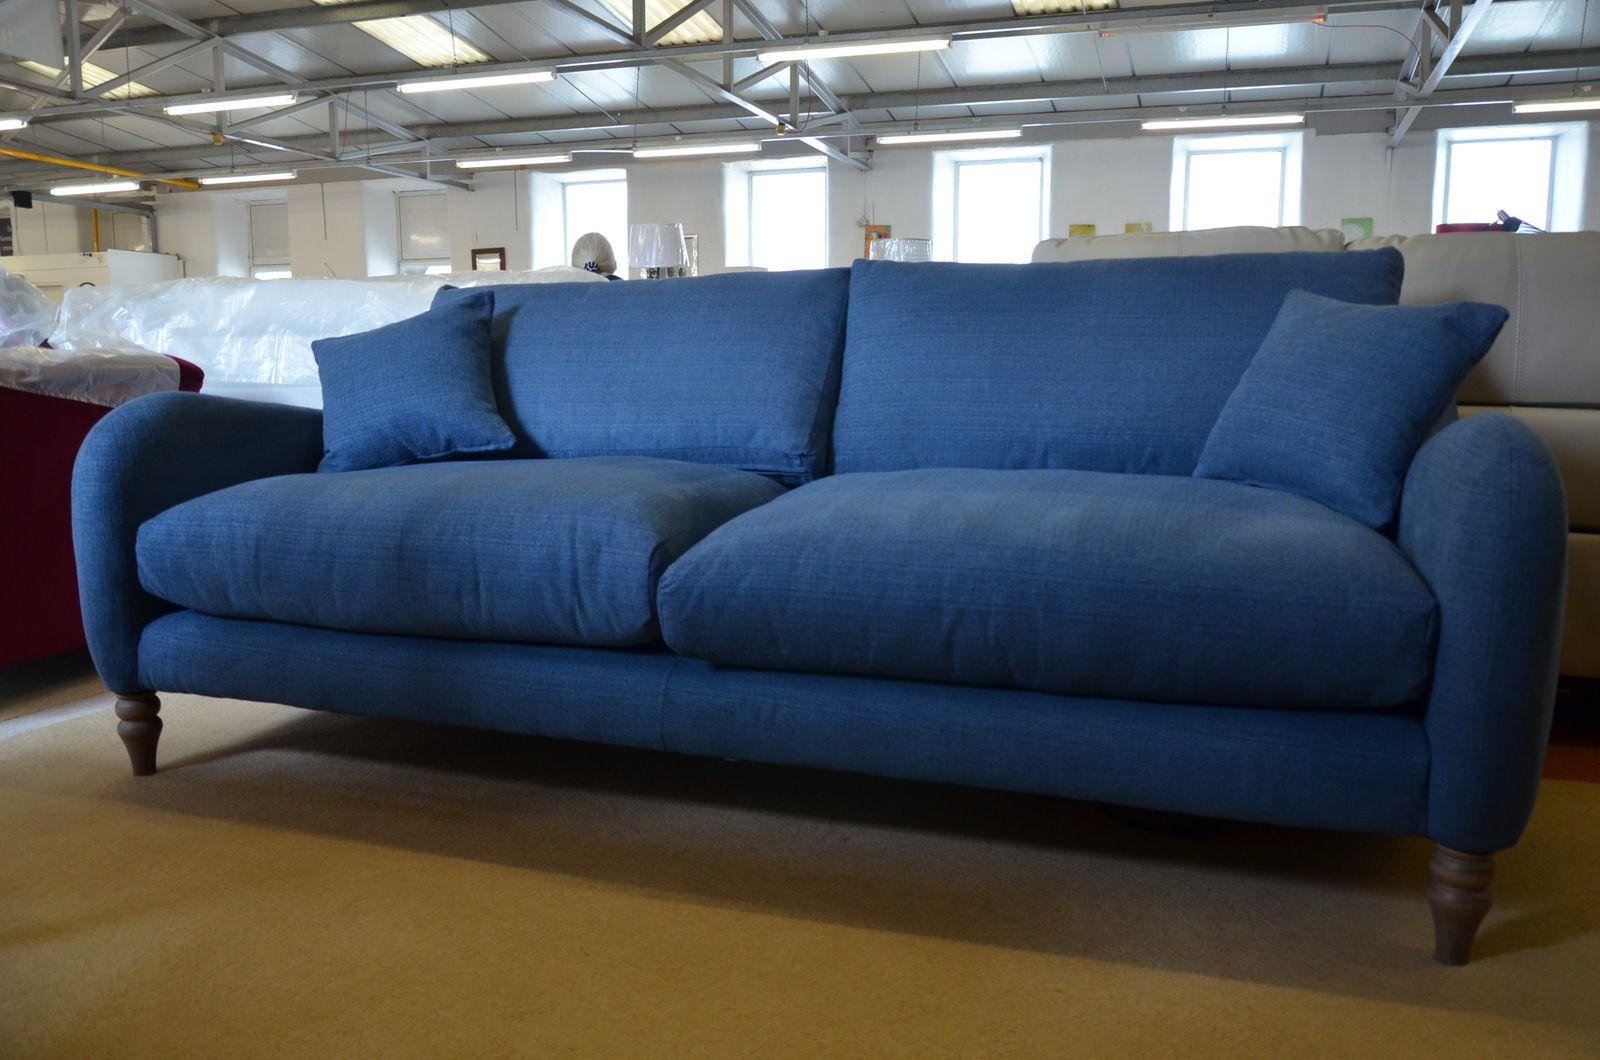 Tivoli Large 3 Seater Sofa In Blue Cotton Fabric